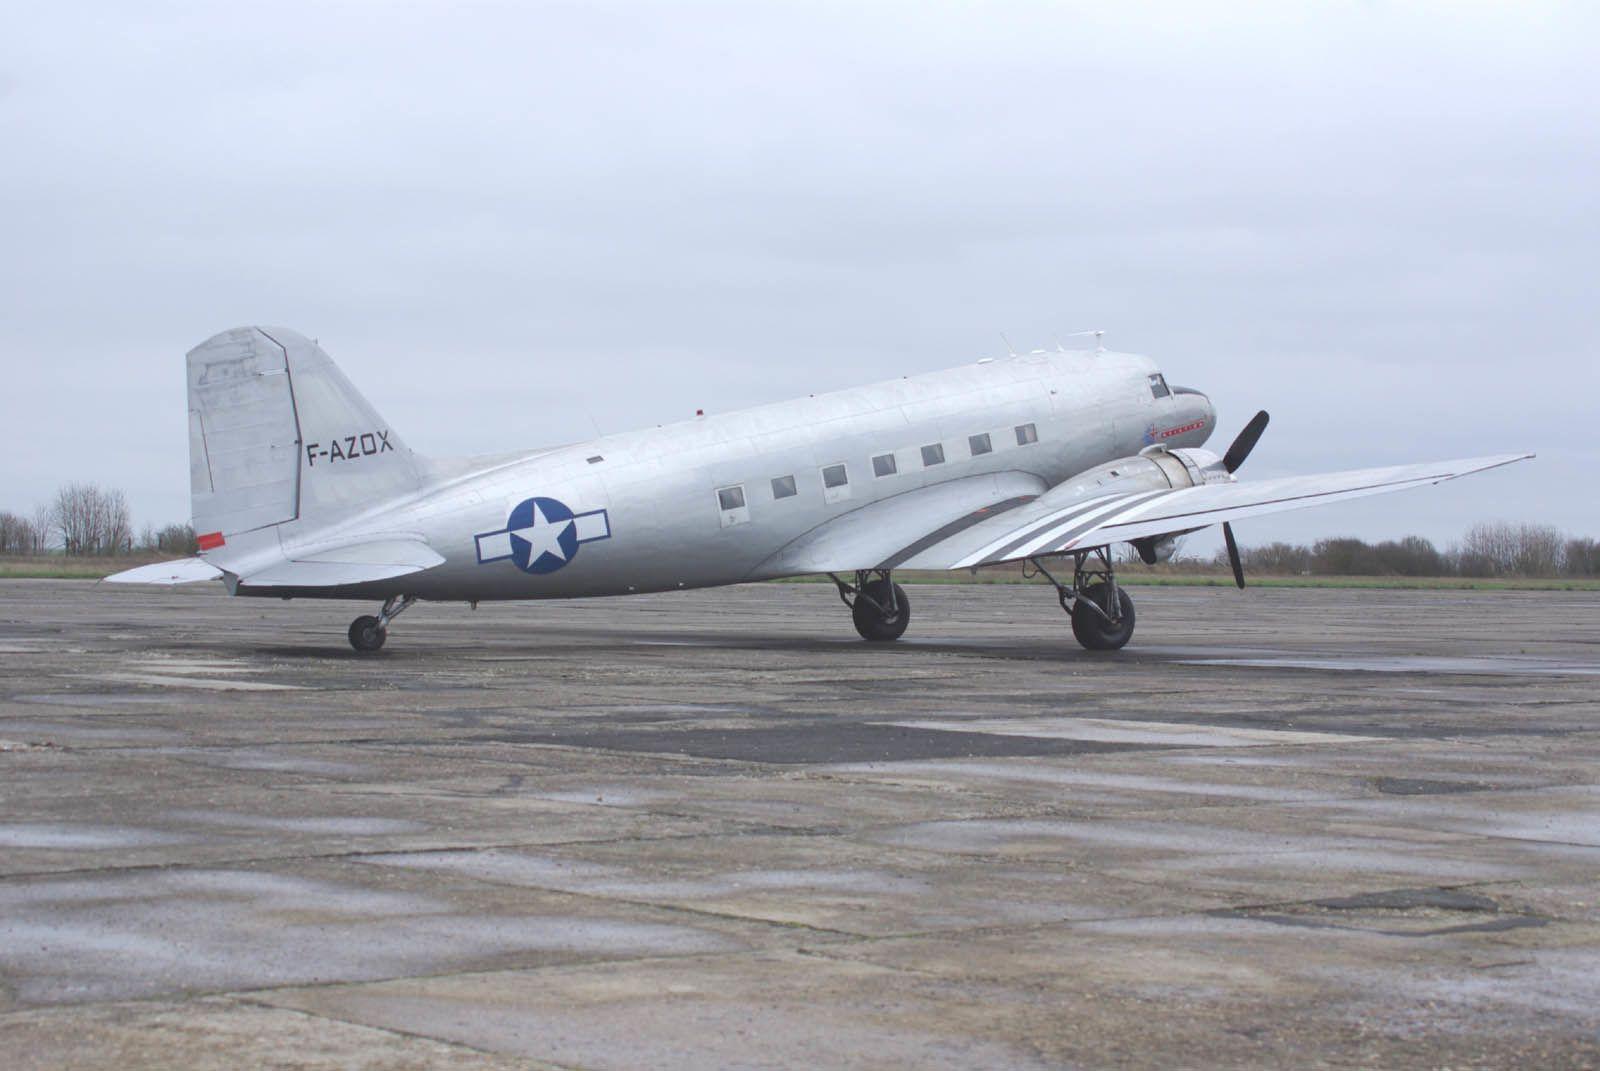 Le DC-3 F-AZOX.